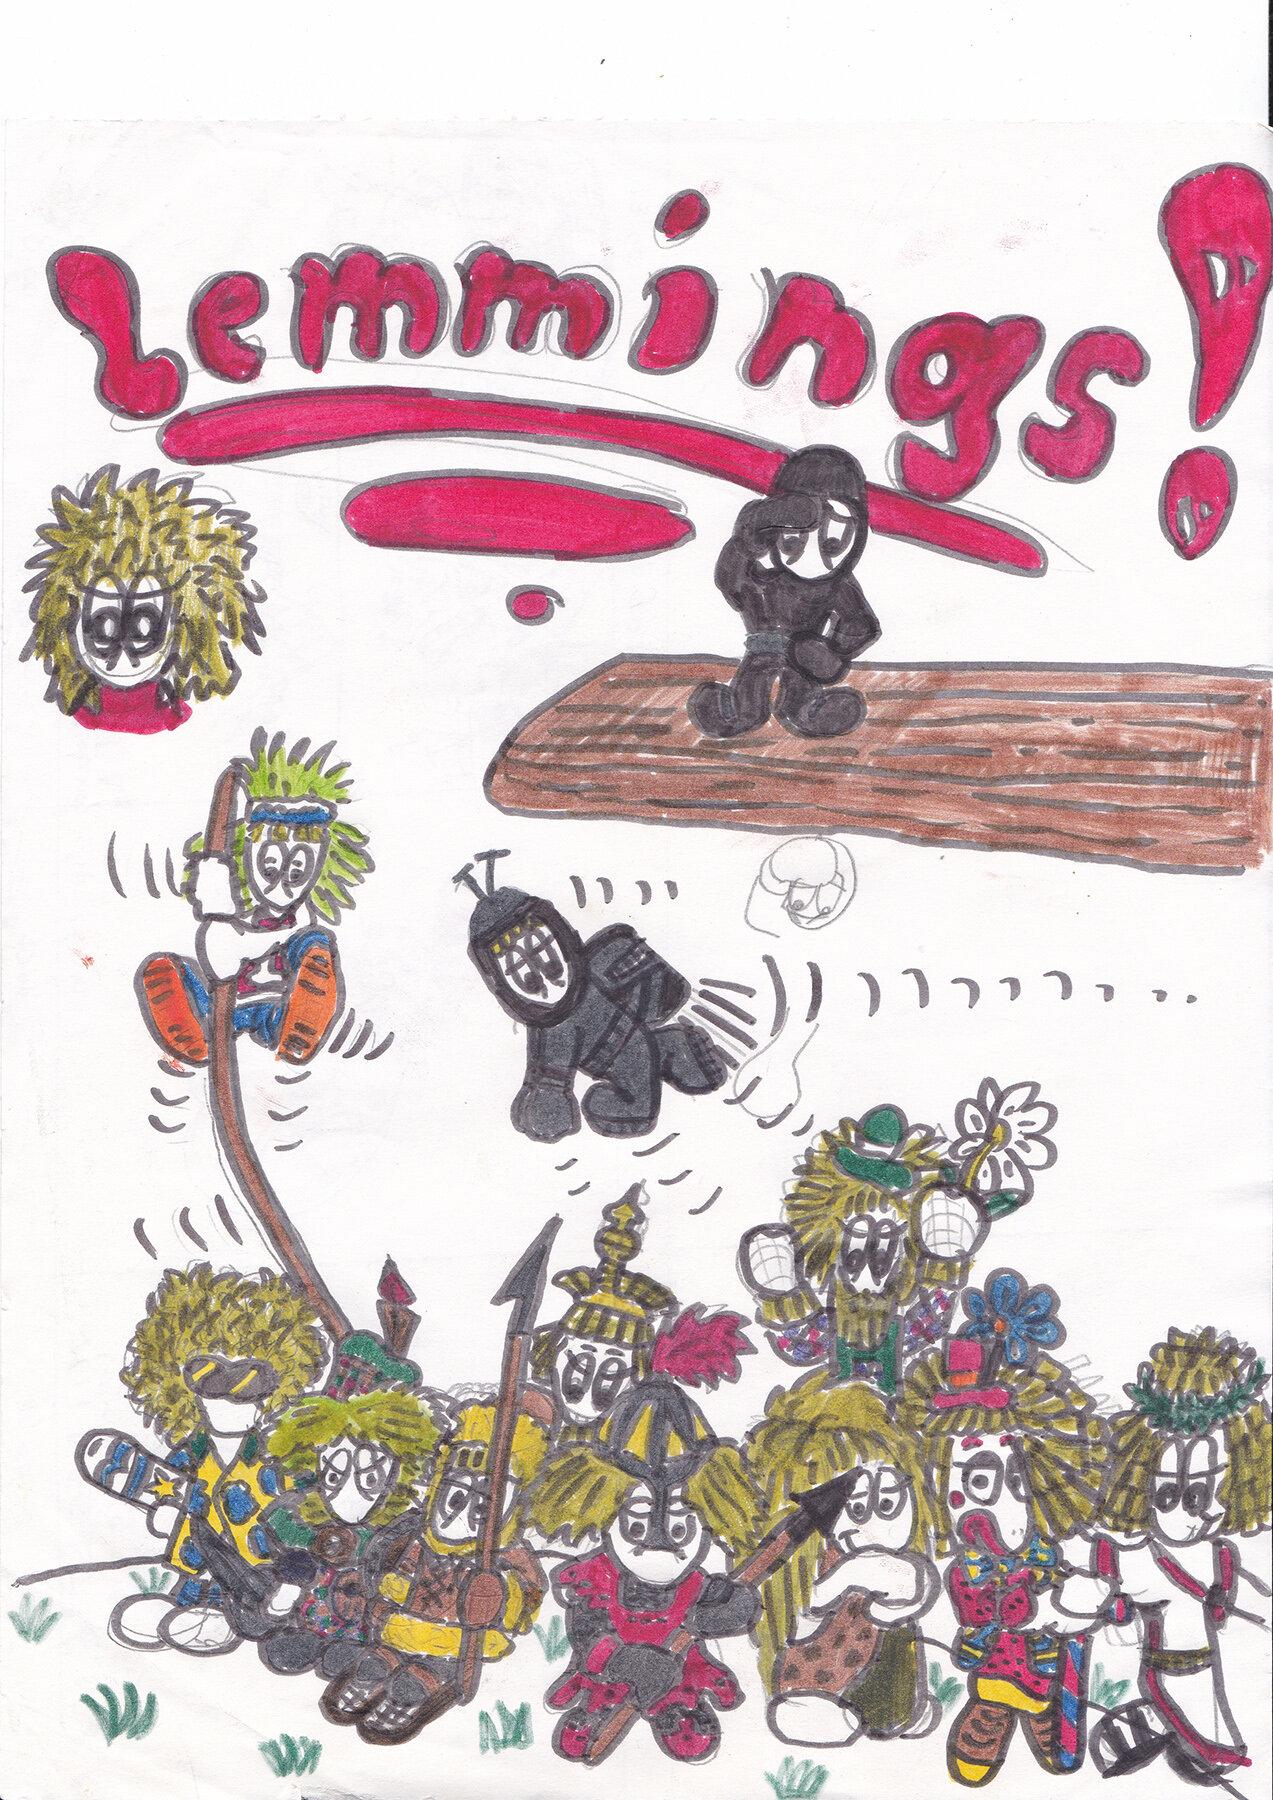 Lemmings 2 (1993/94)